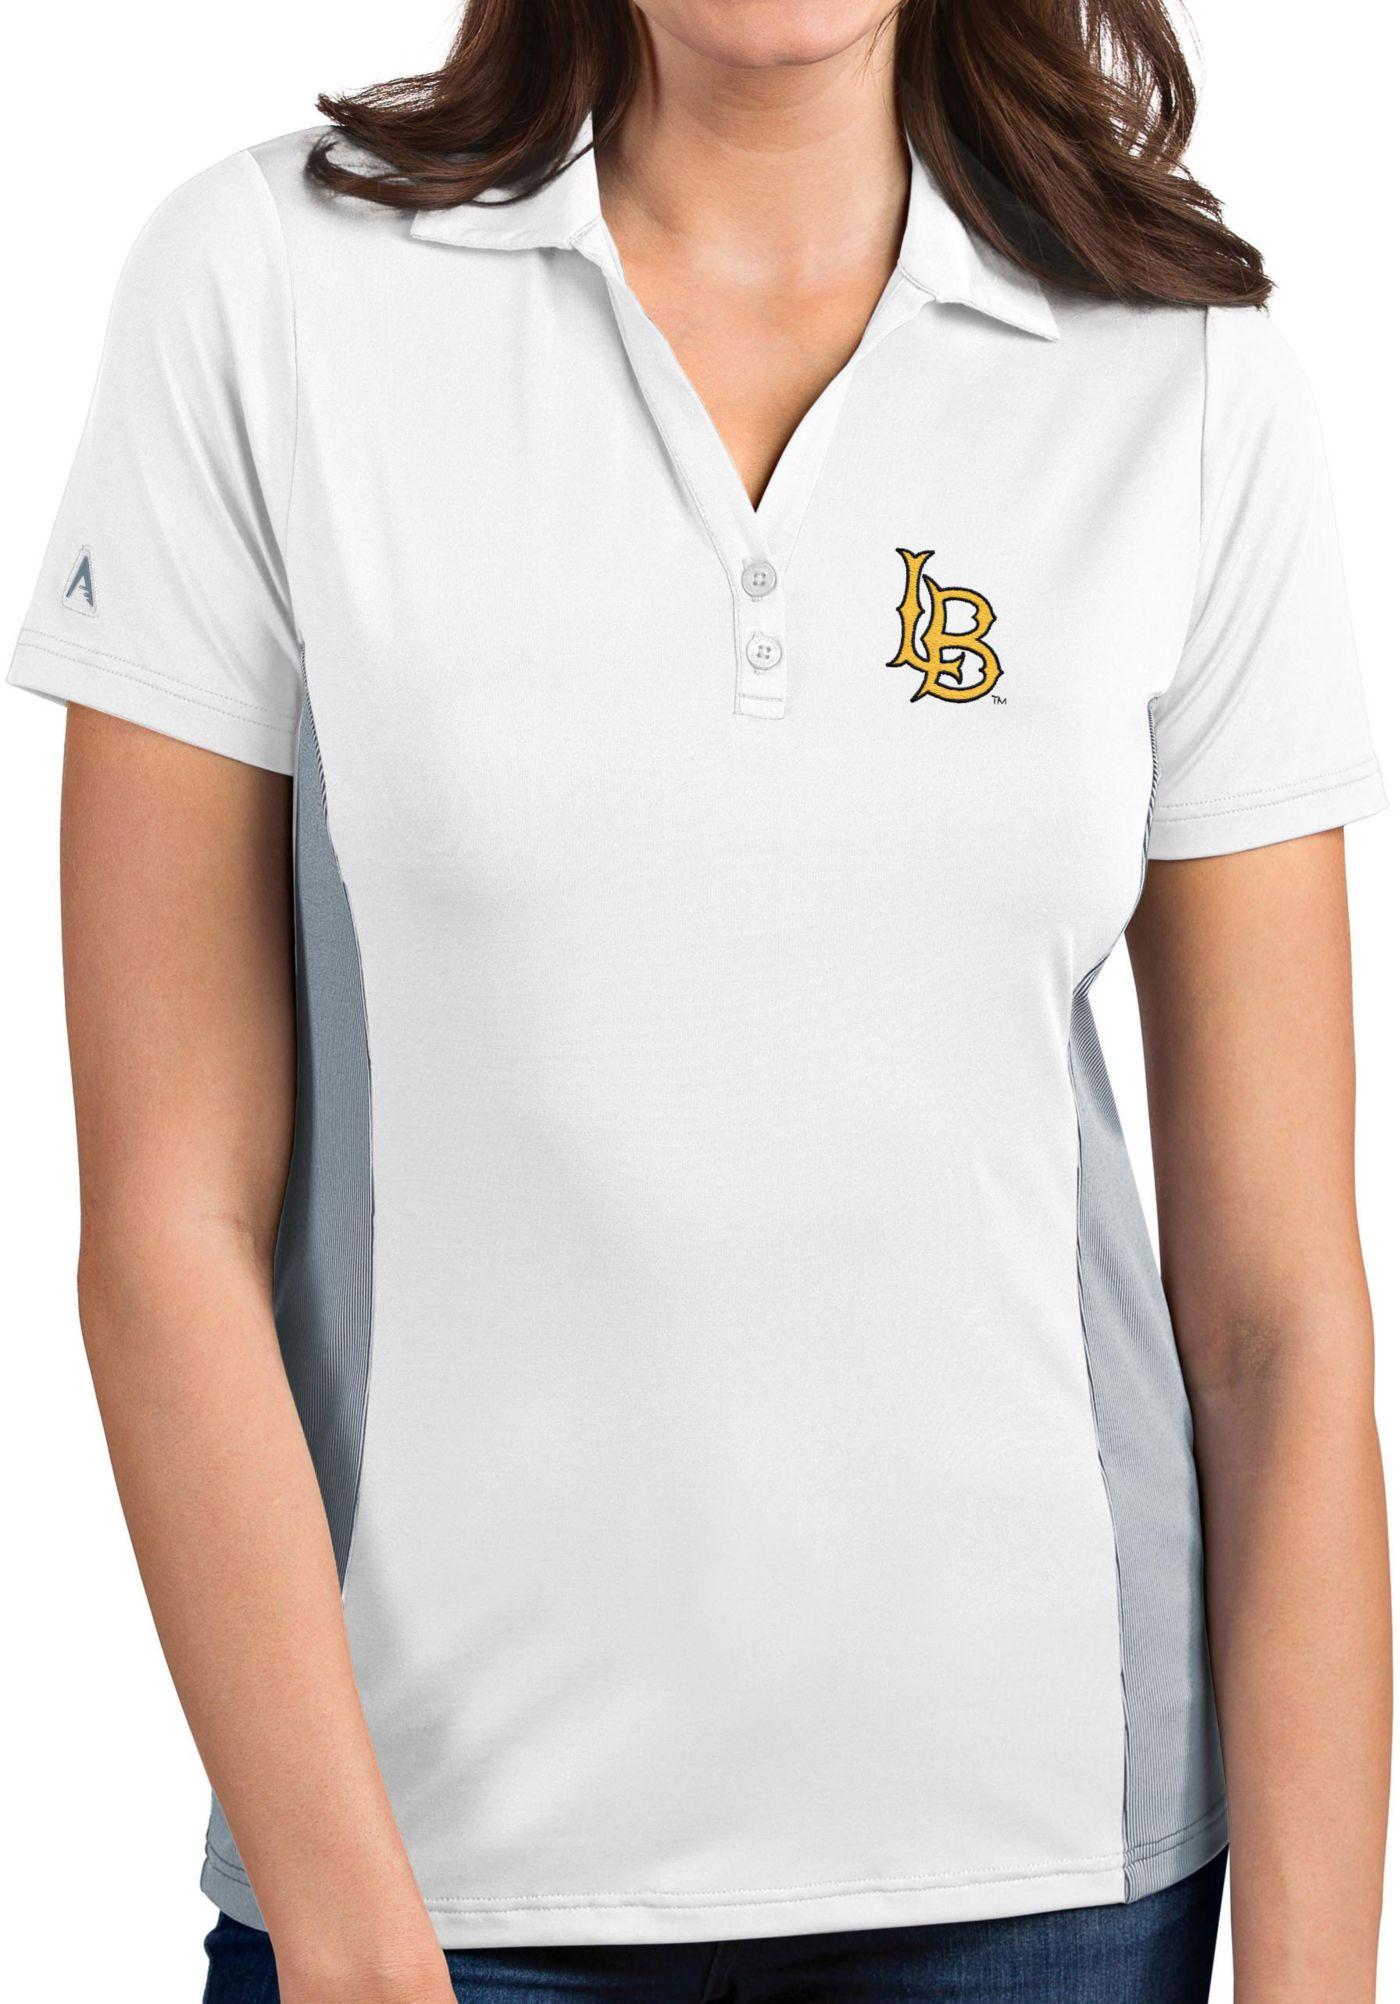 Antigua Women's Long Beach State 49ers Venture White Polo